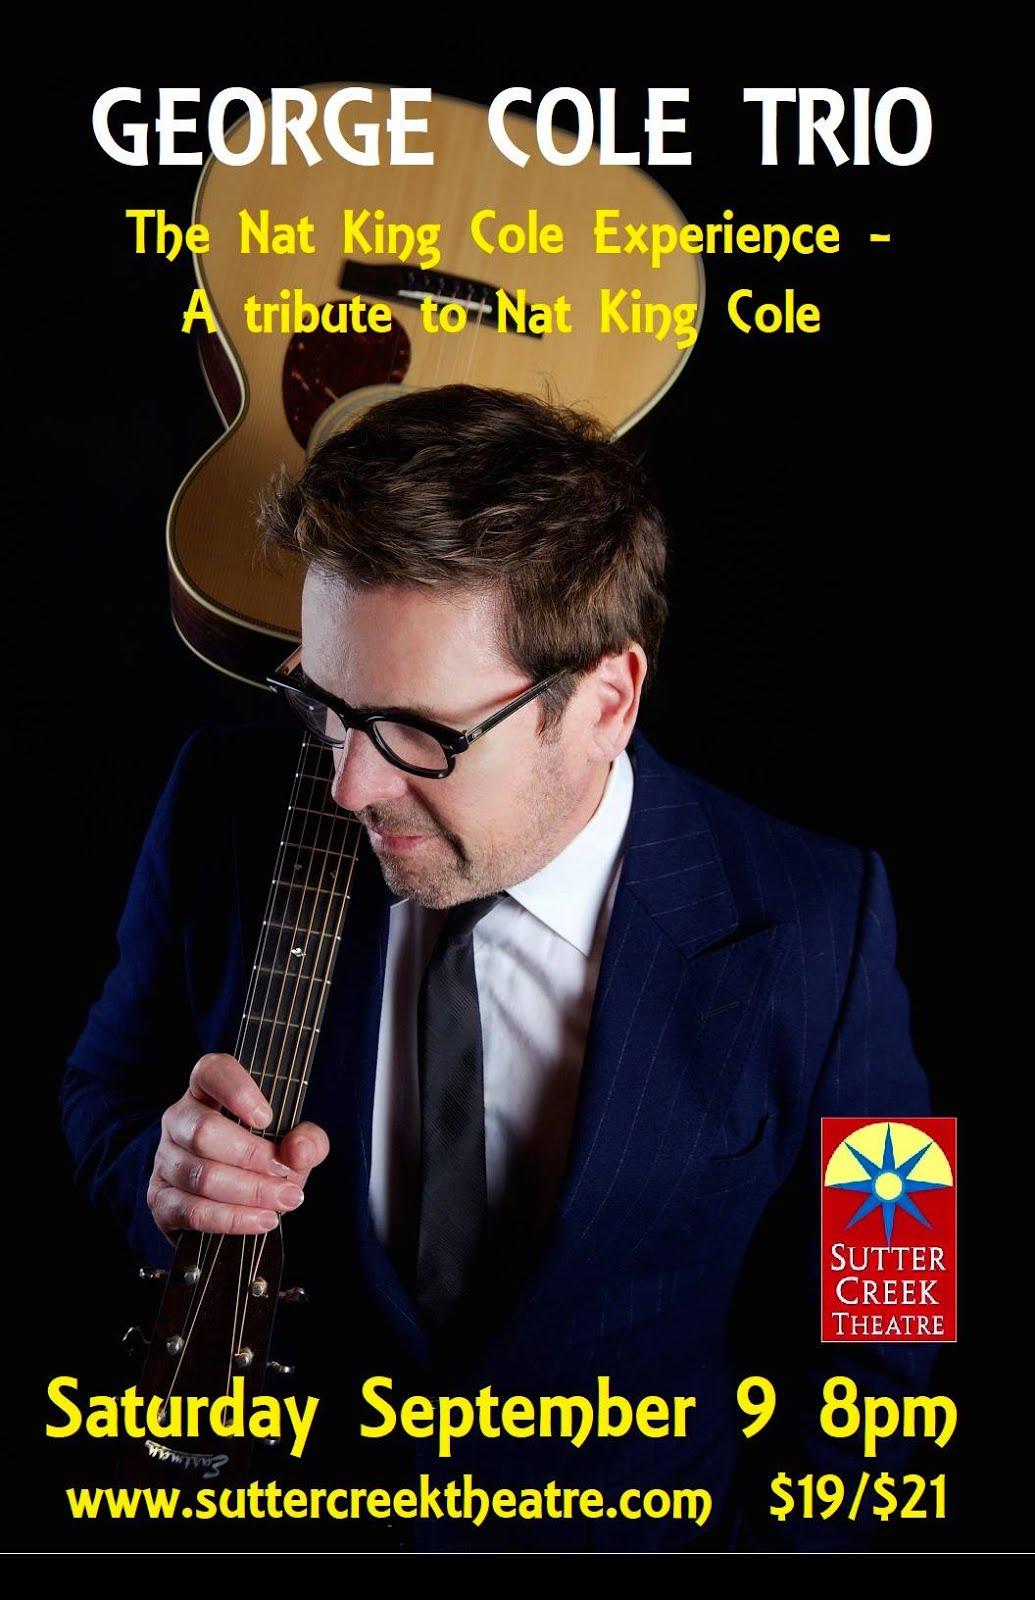 George Cole Trio - Sat Sept 9